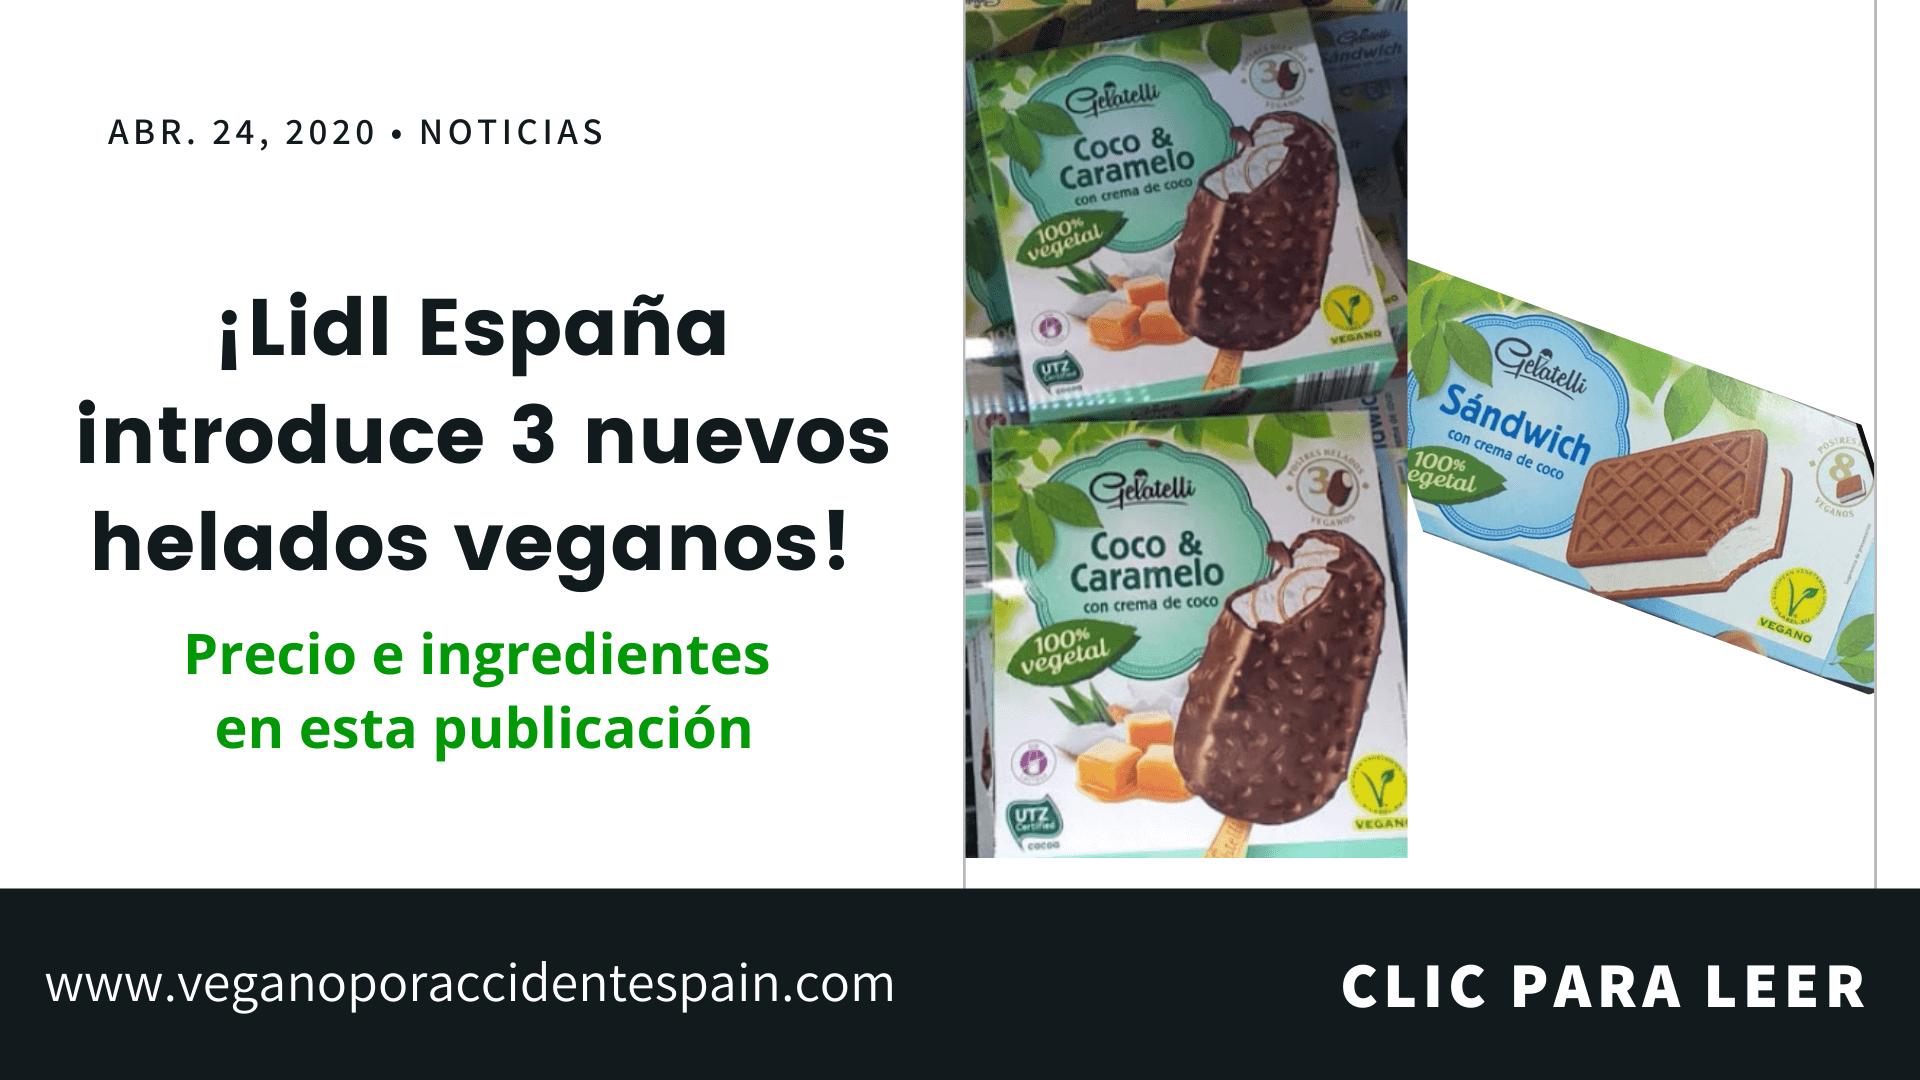 Nuevos helados veganos Lidl